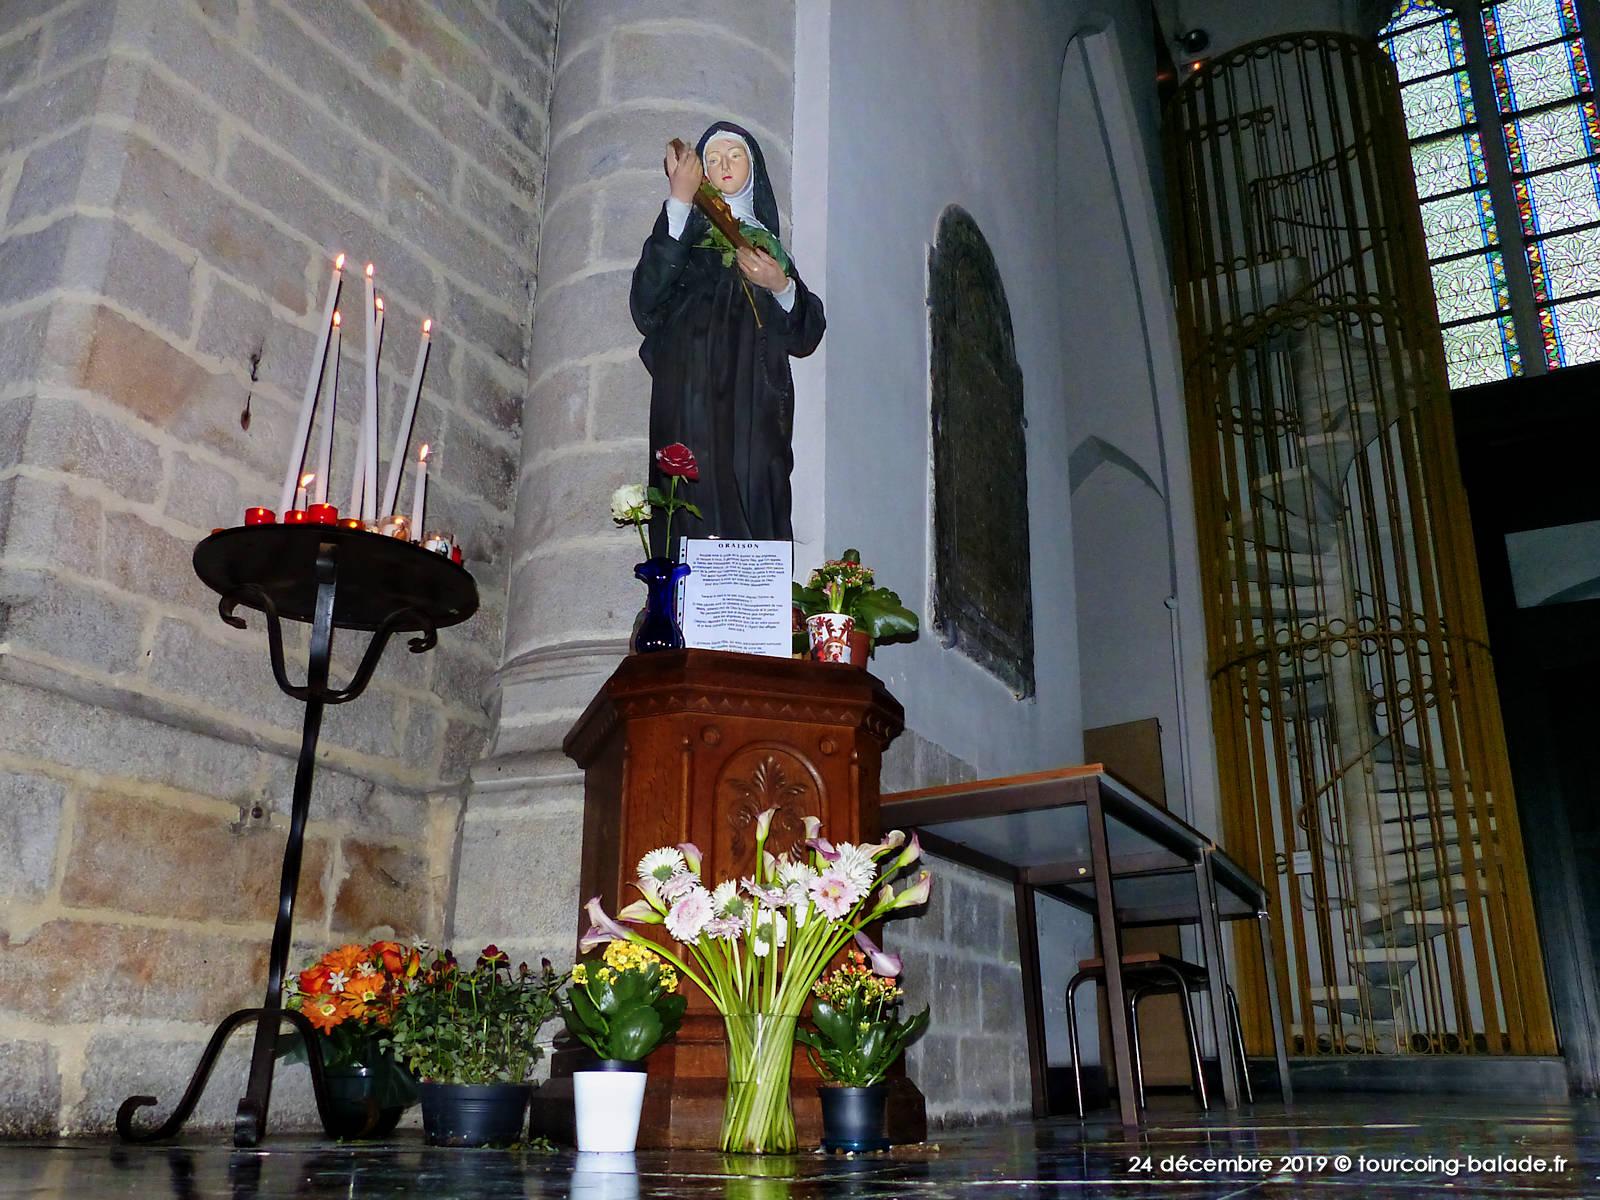 Église Saint Christophe Tourcoing - Sainte Rita, 2019